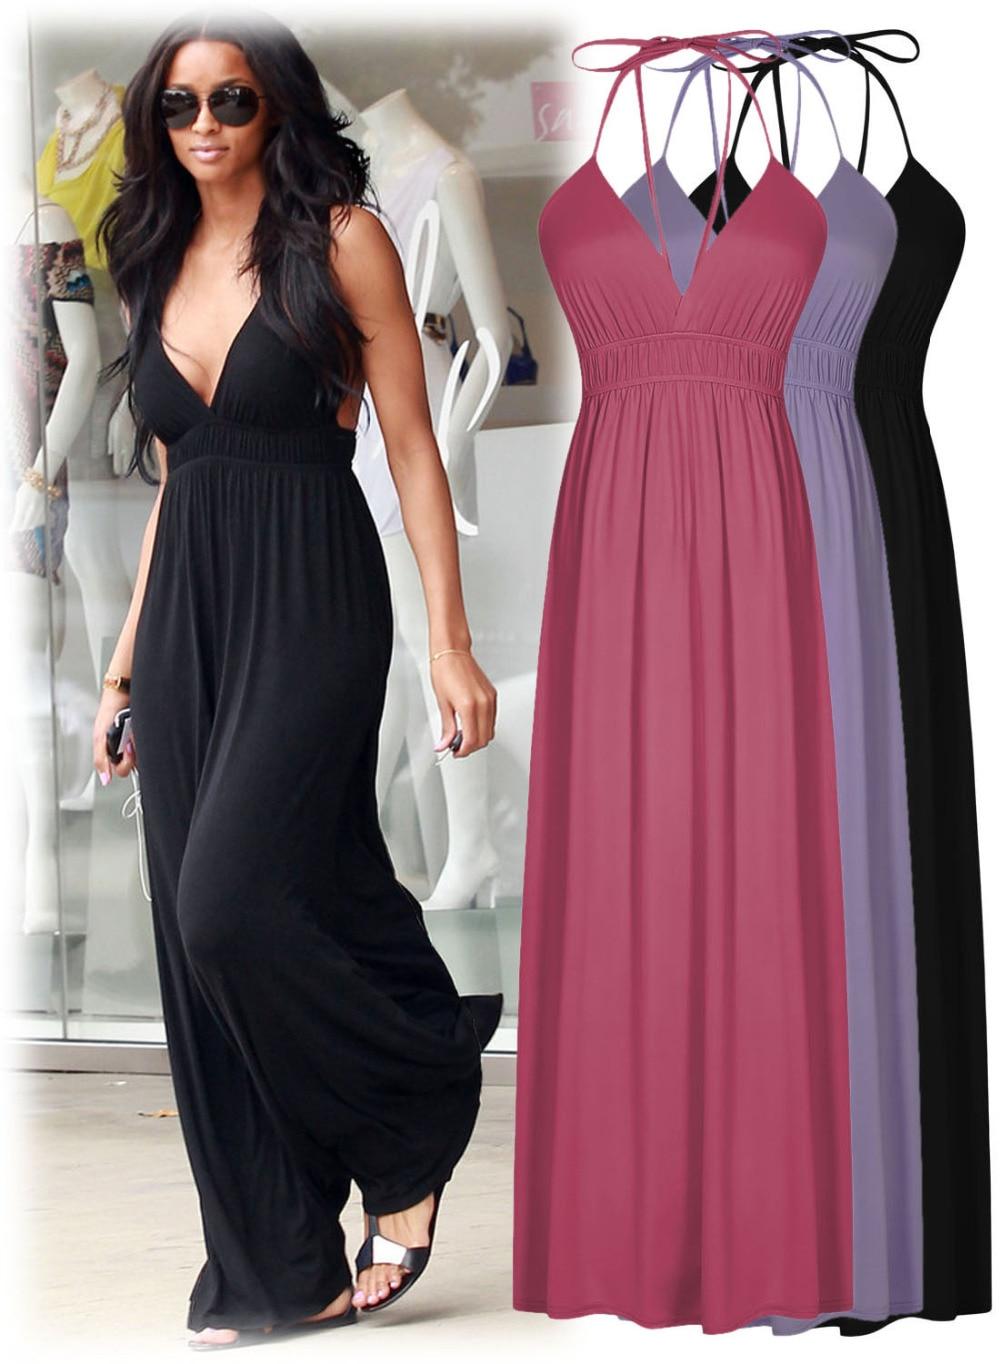 Hawaiian Theme Dress for Sale